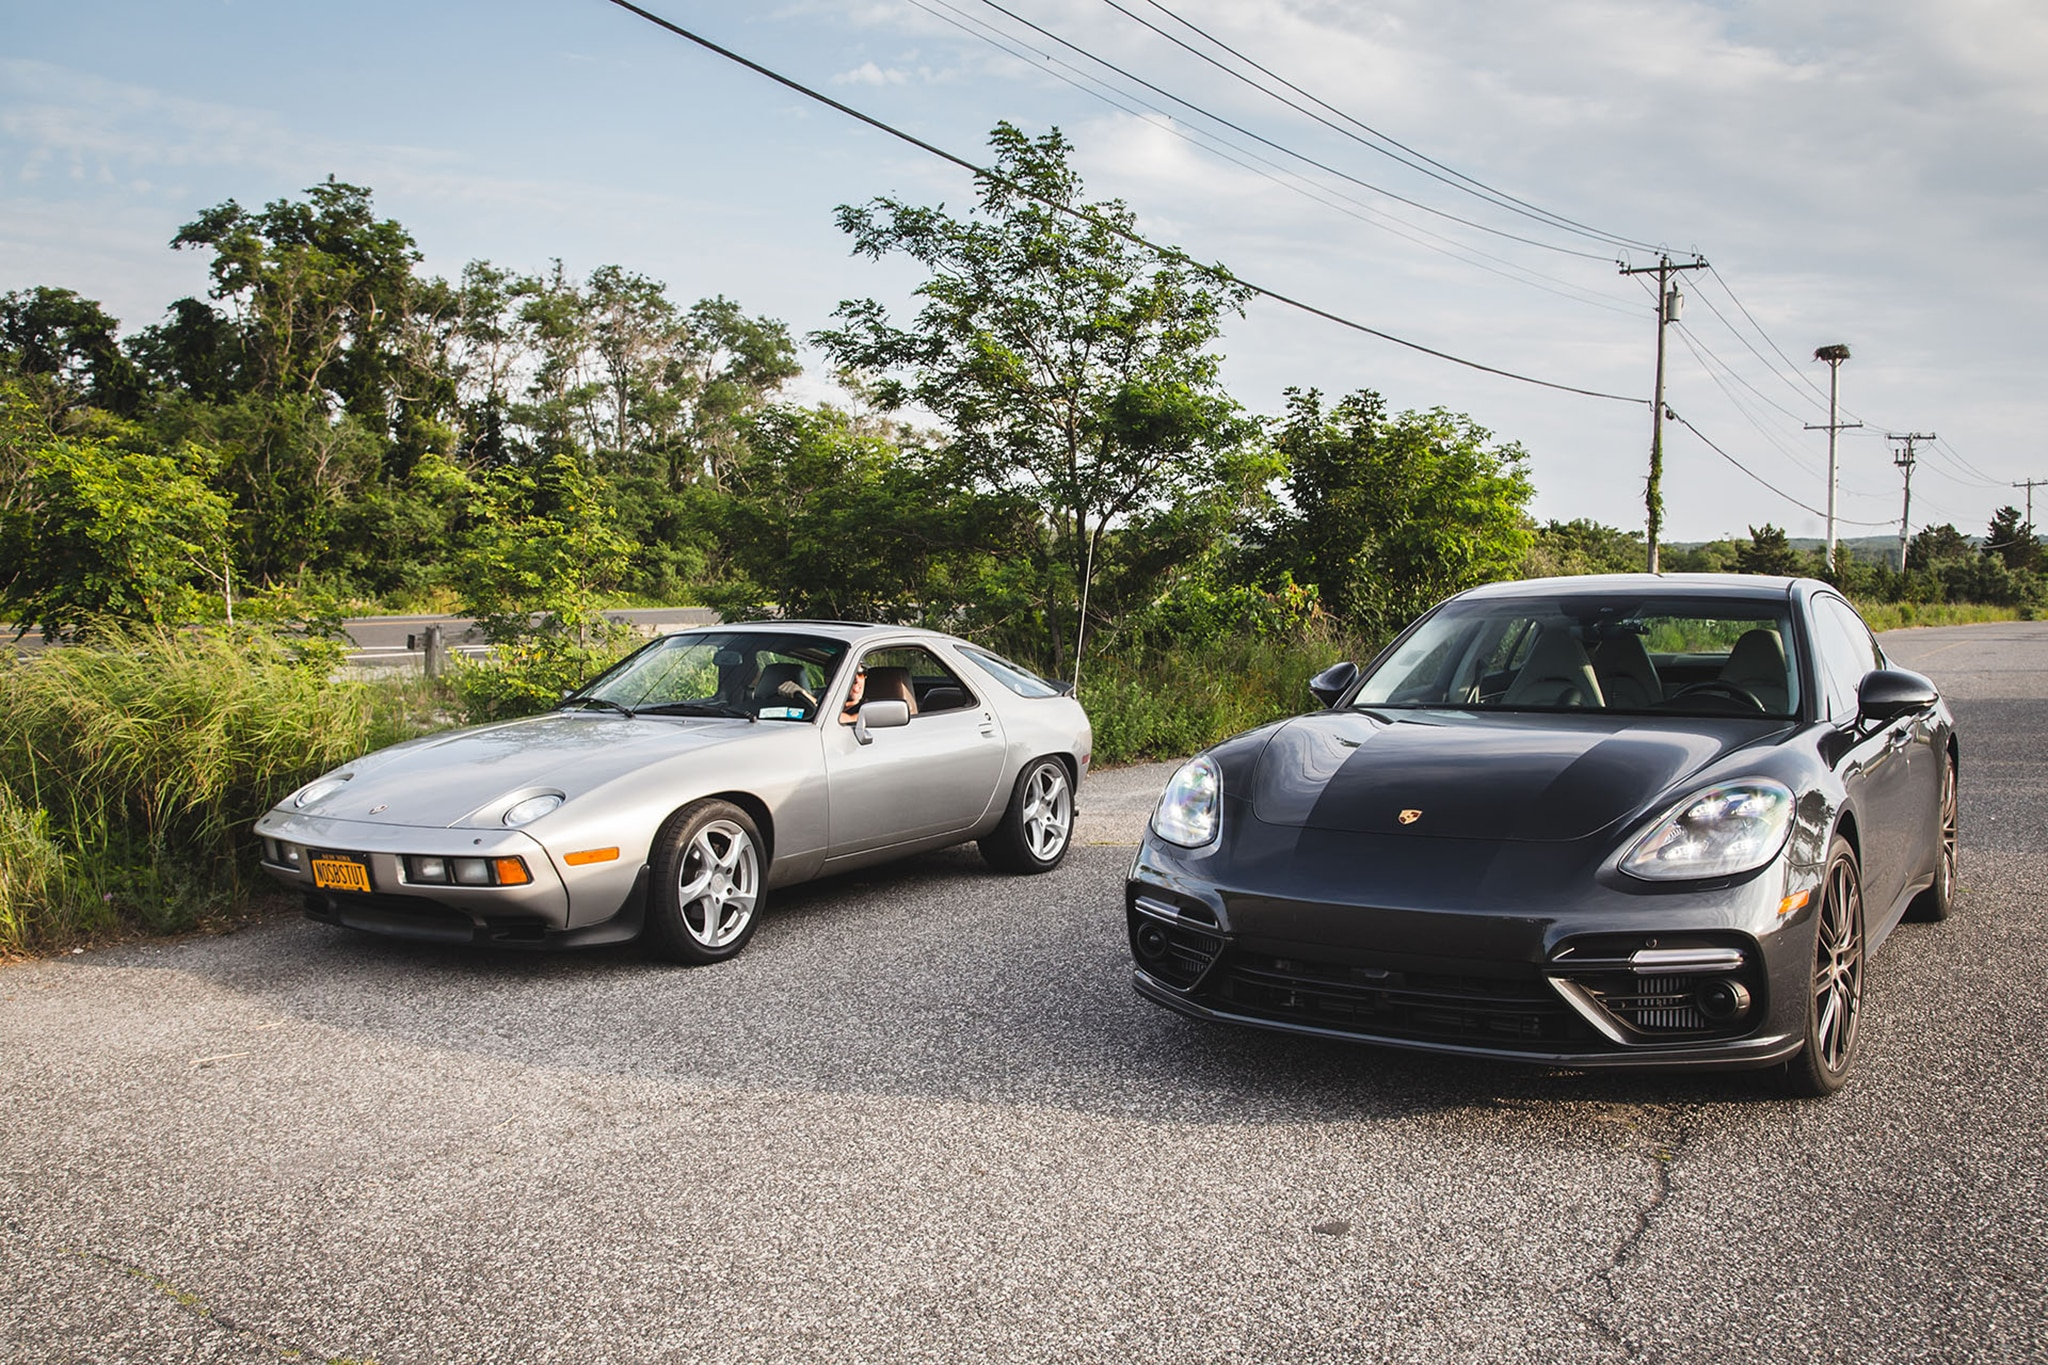 1982 Porsche 928 Meets 2017 Porsche Panamera Turbo 06